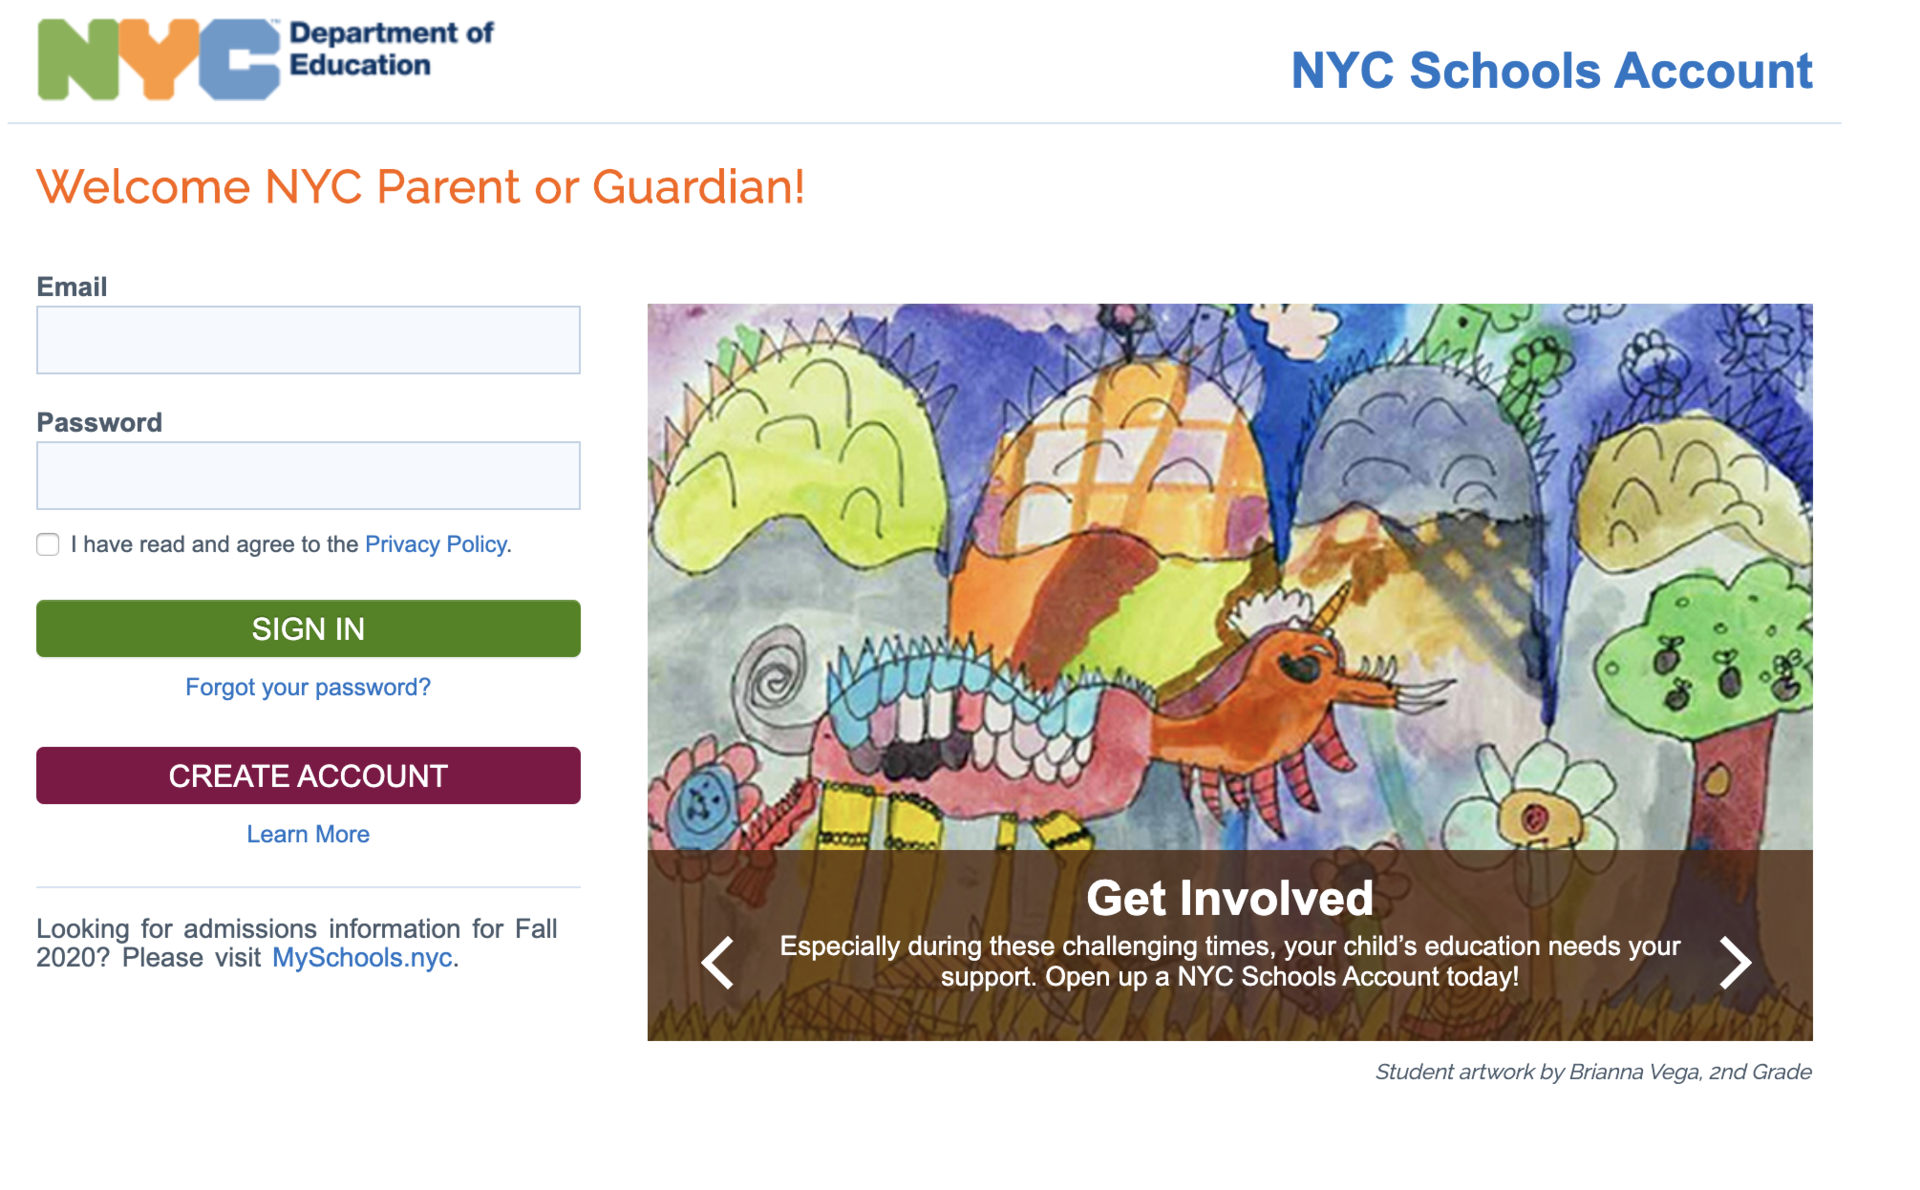 NYC School Account